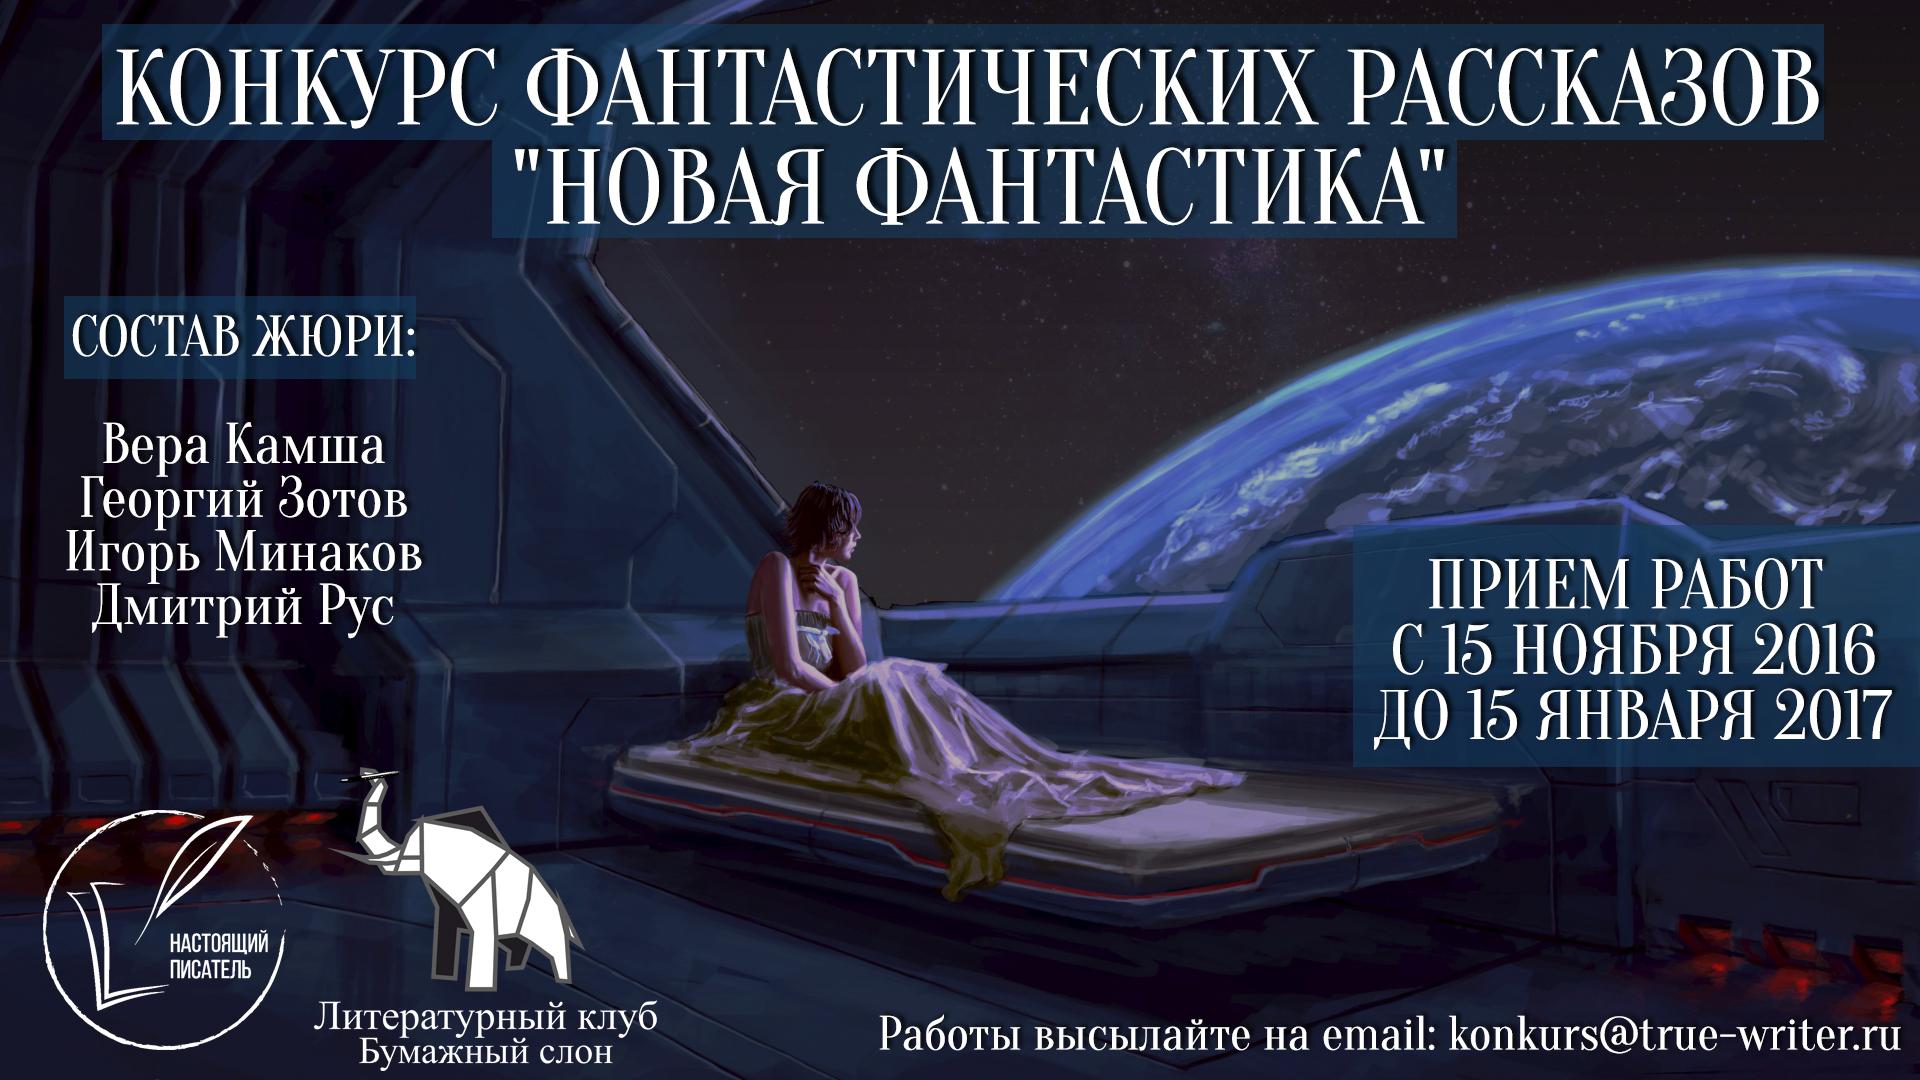 girl_planet_ship_space_60088_1920x1080